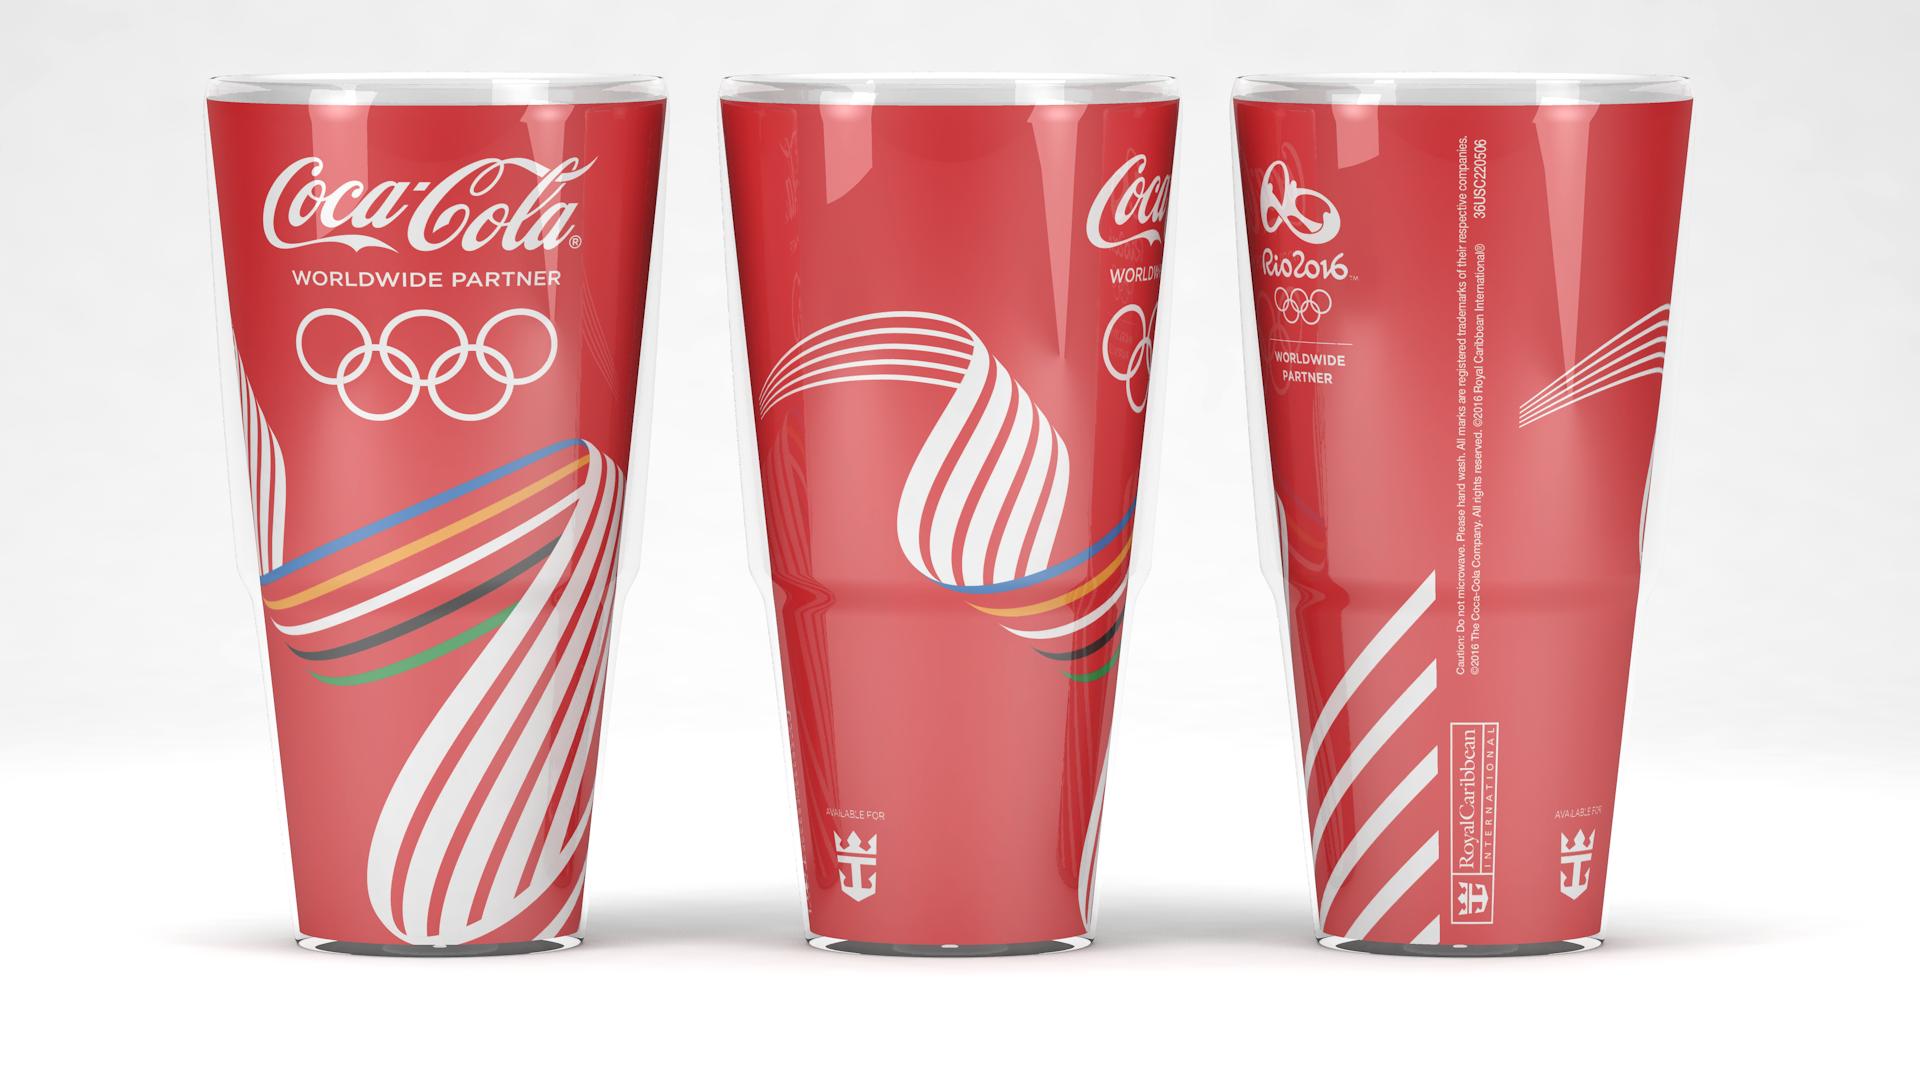 olympic-tumbler-royal-caribbean-coca-cola-nms3